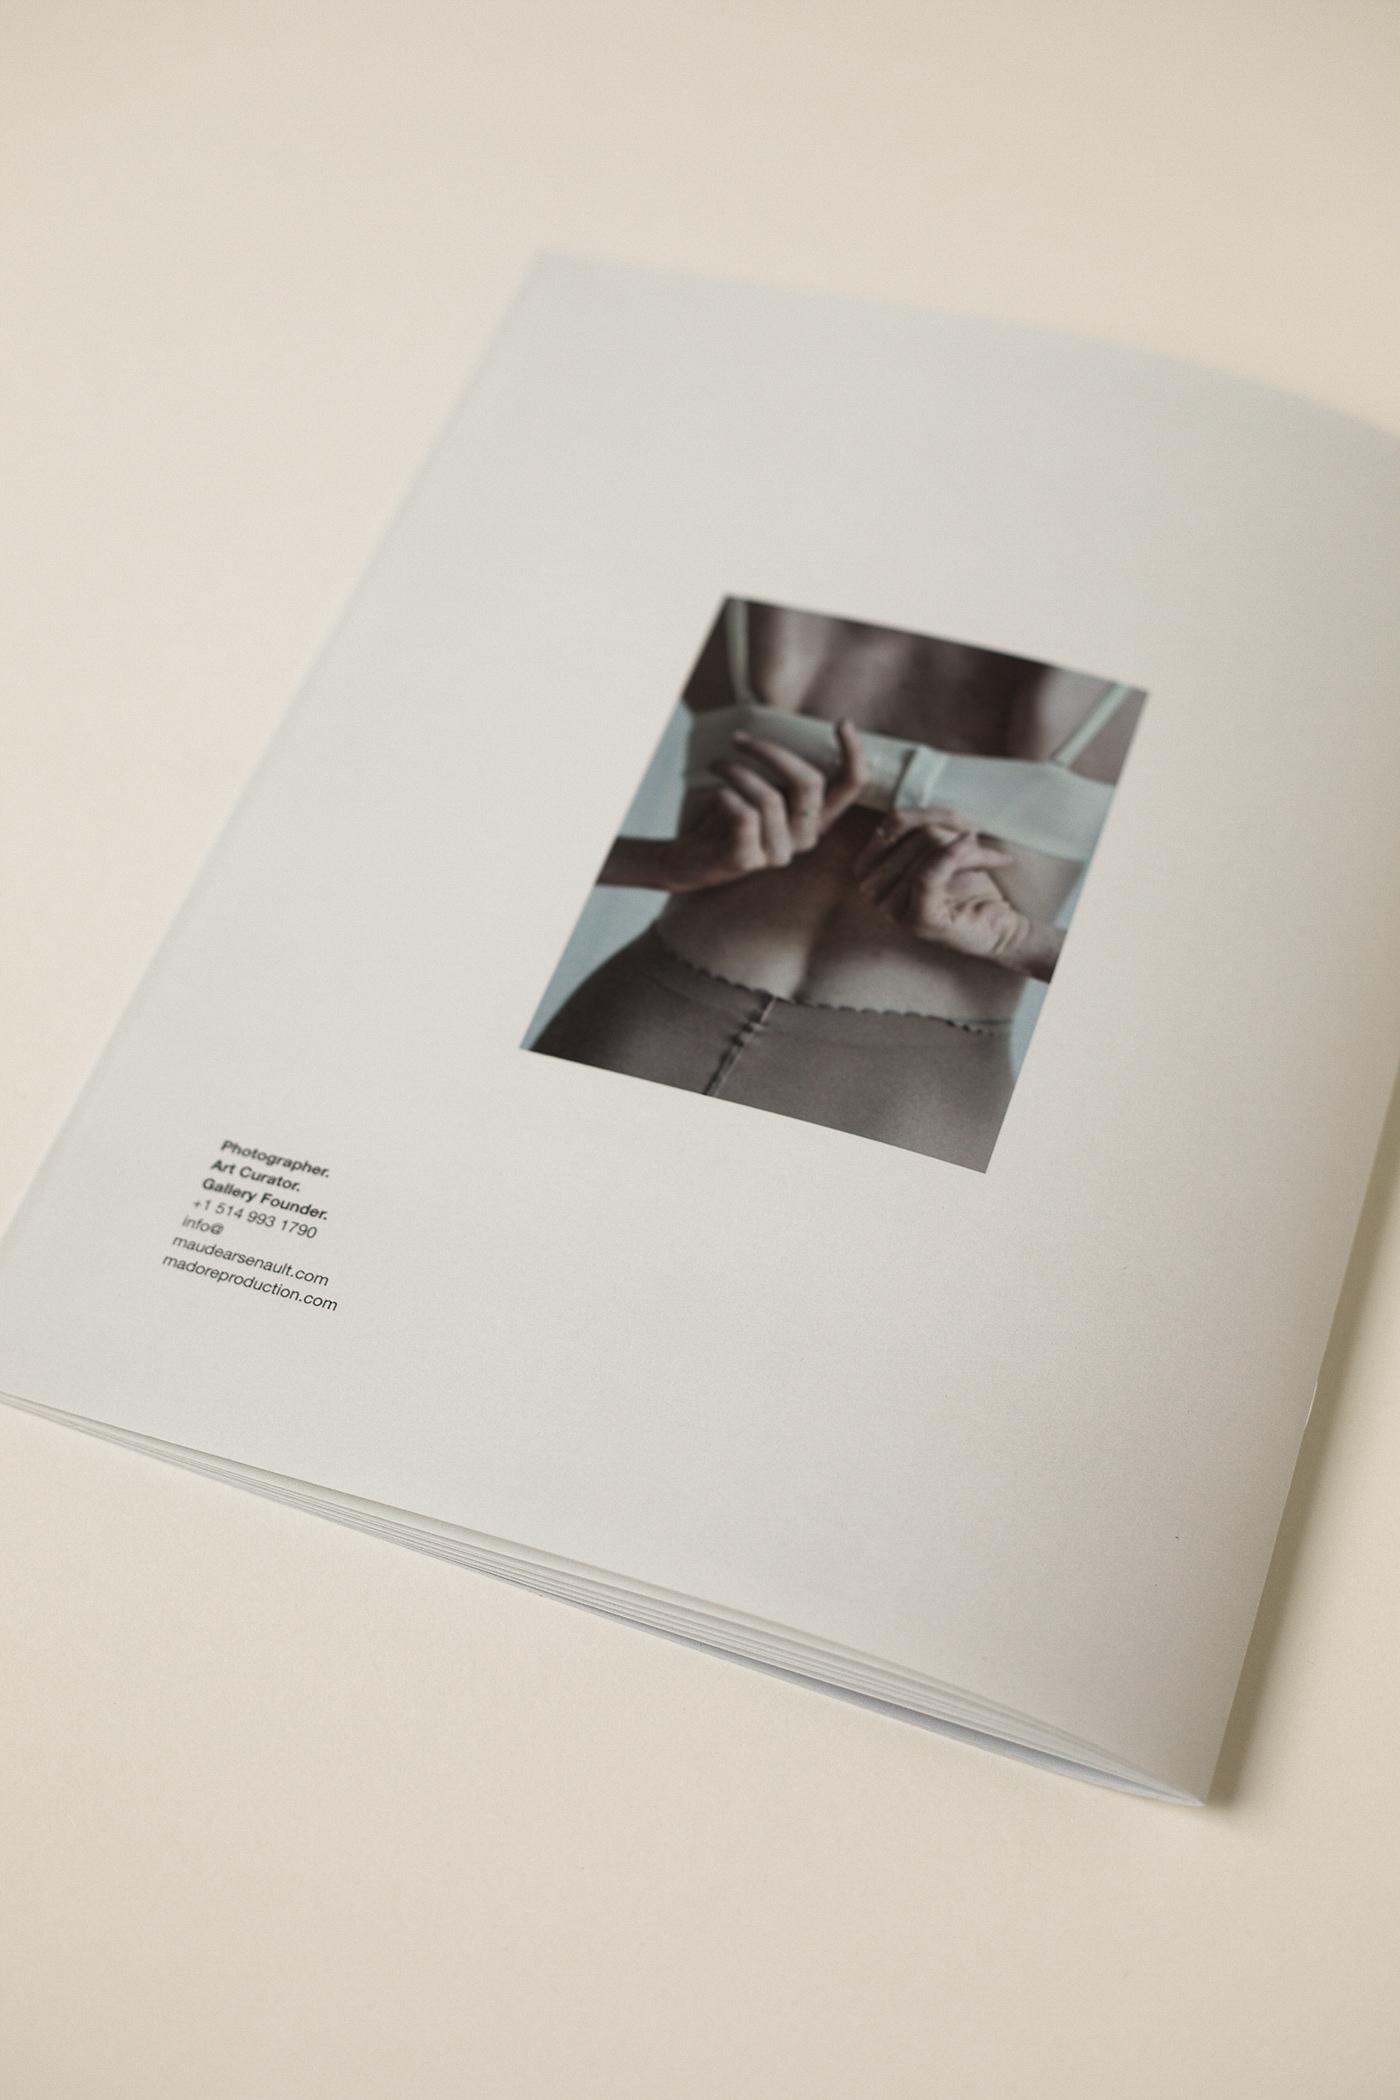 fashion photography branding  design editorial photo book Promo photo editorial design